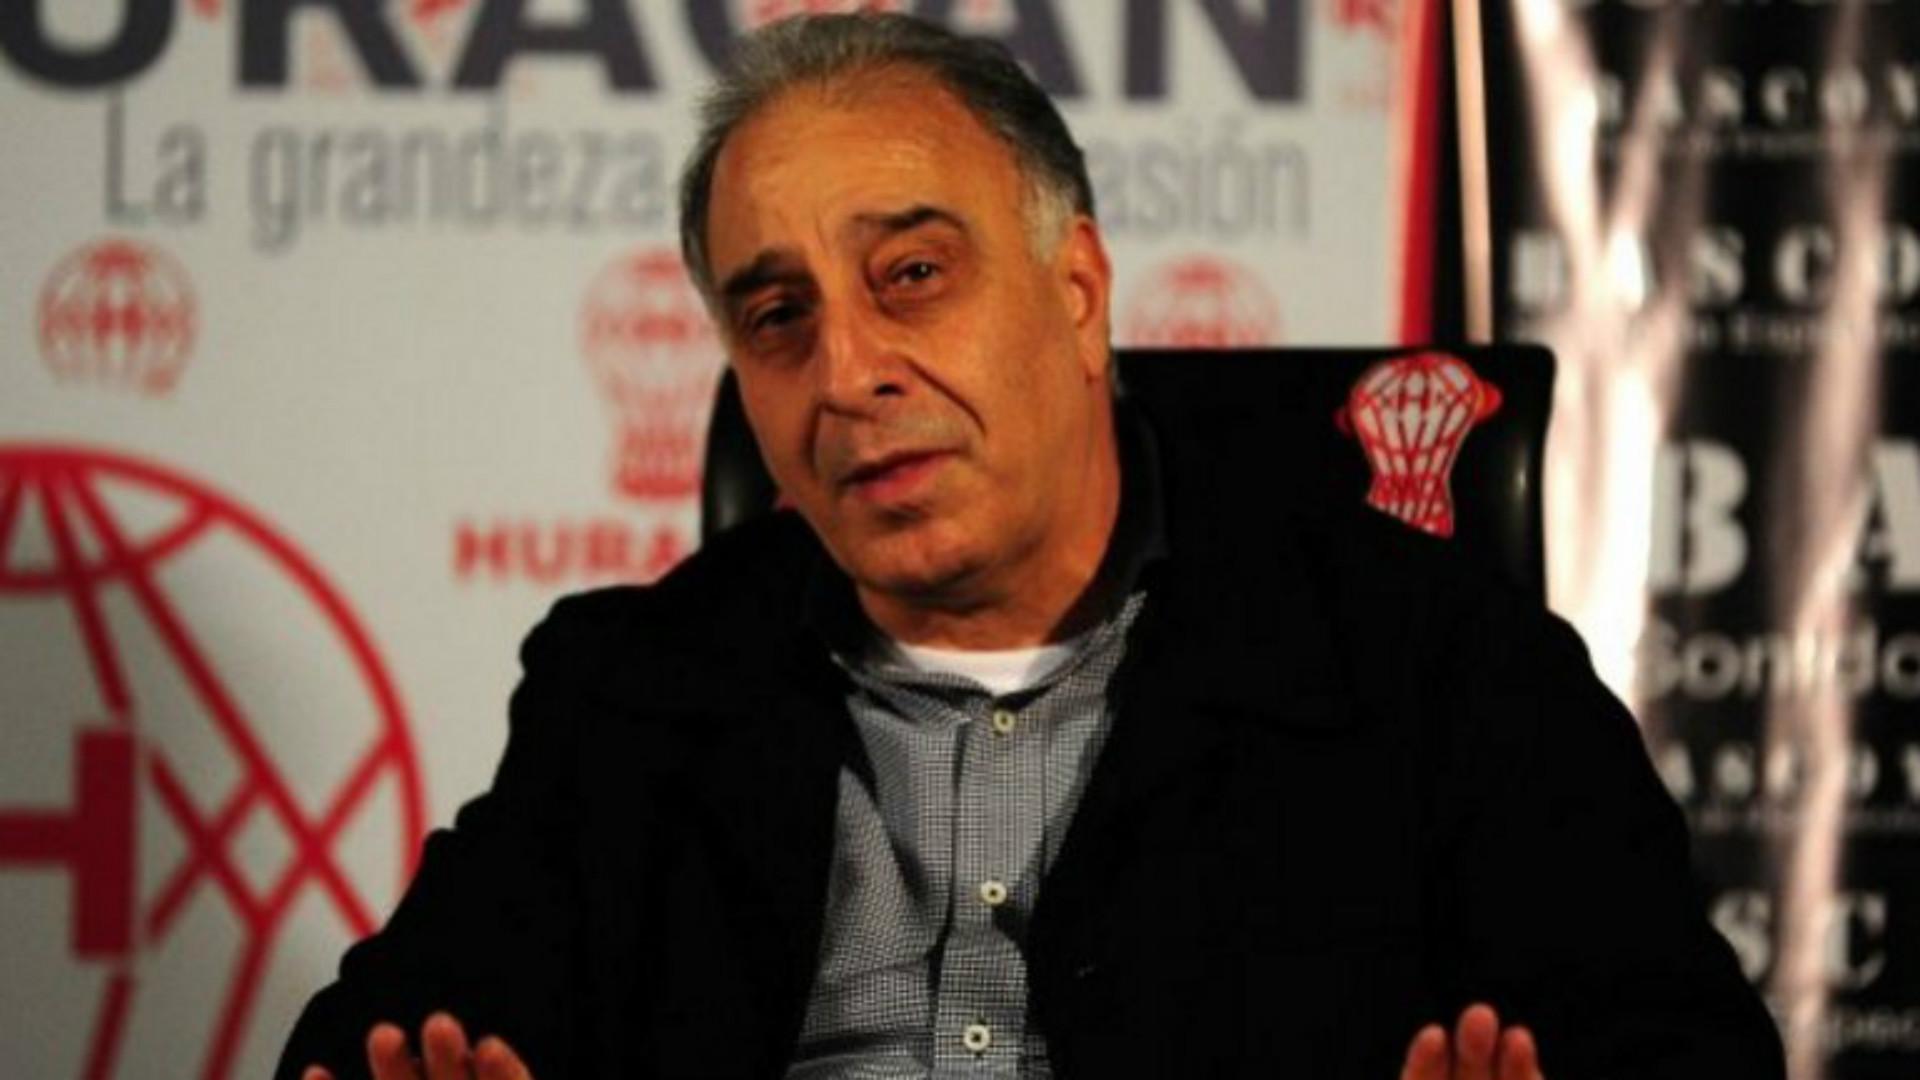 Chapecoense: presidente de Huracán, Alejandro Nadur, lanza polémico comentario tras el accidente